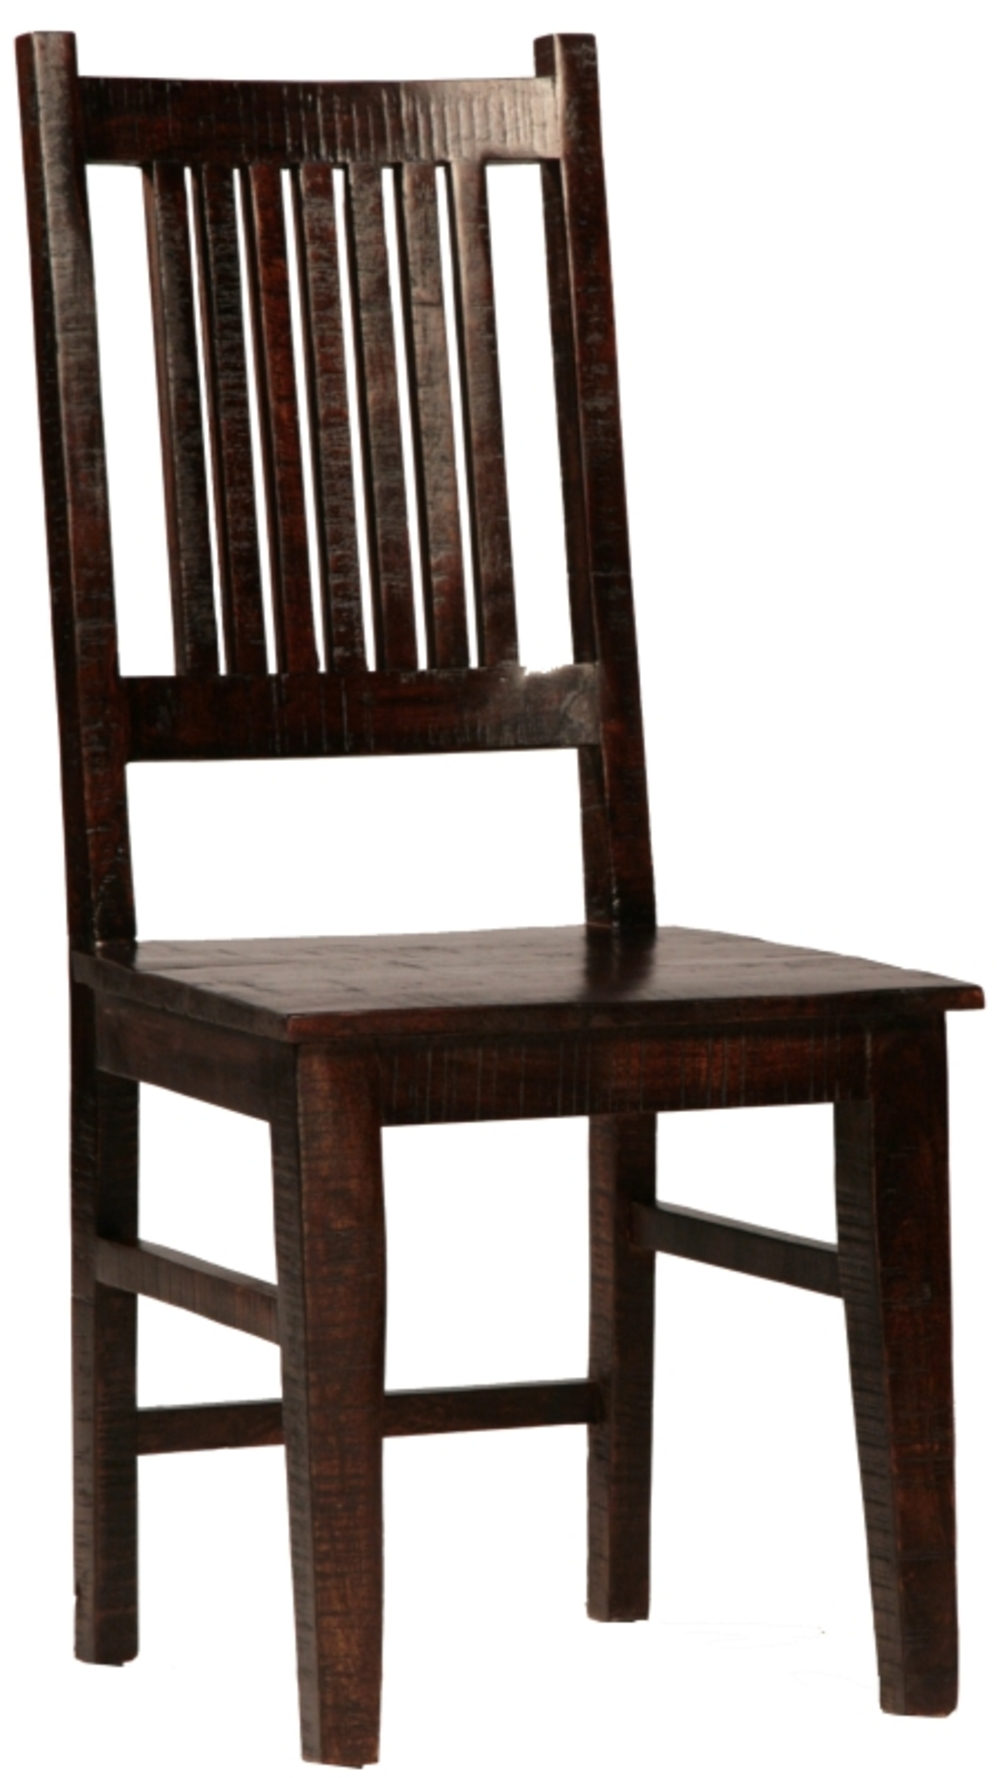 Dovetail Furniture - Havana Chair